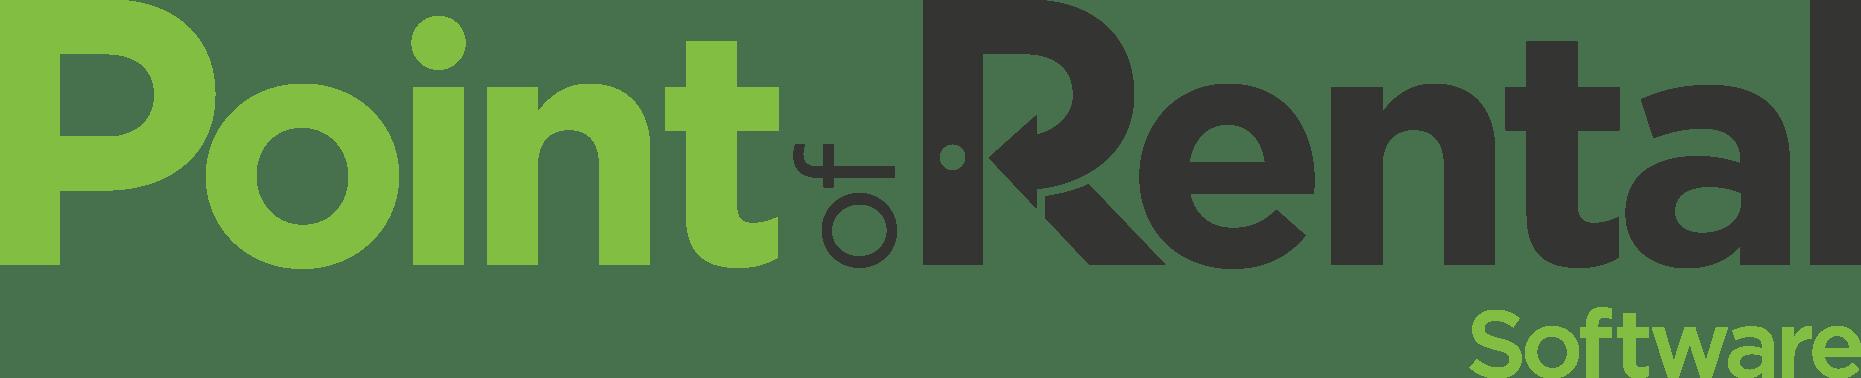 Point of Rental FR | Gestion des stocks et logiciels de location